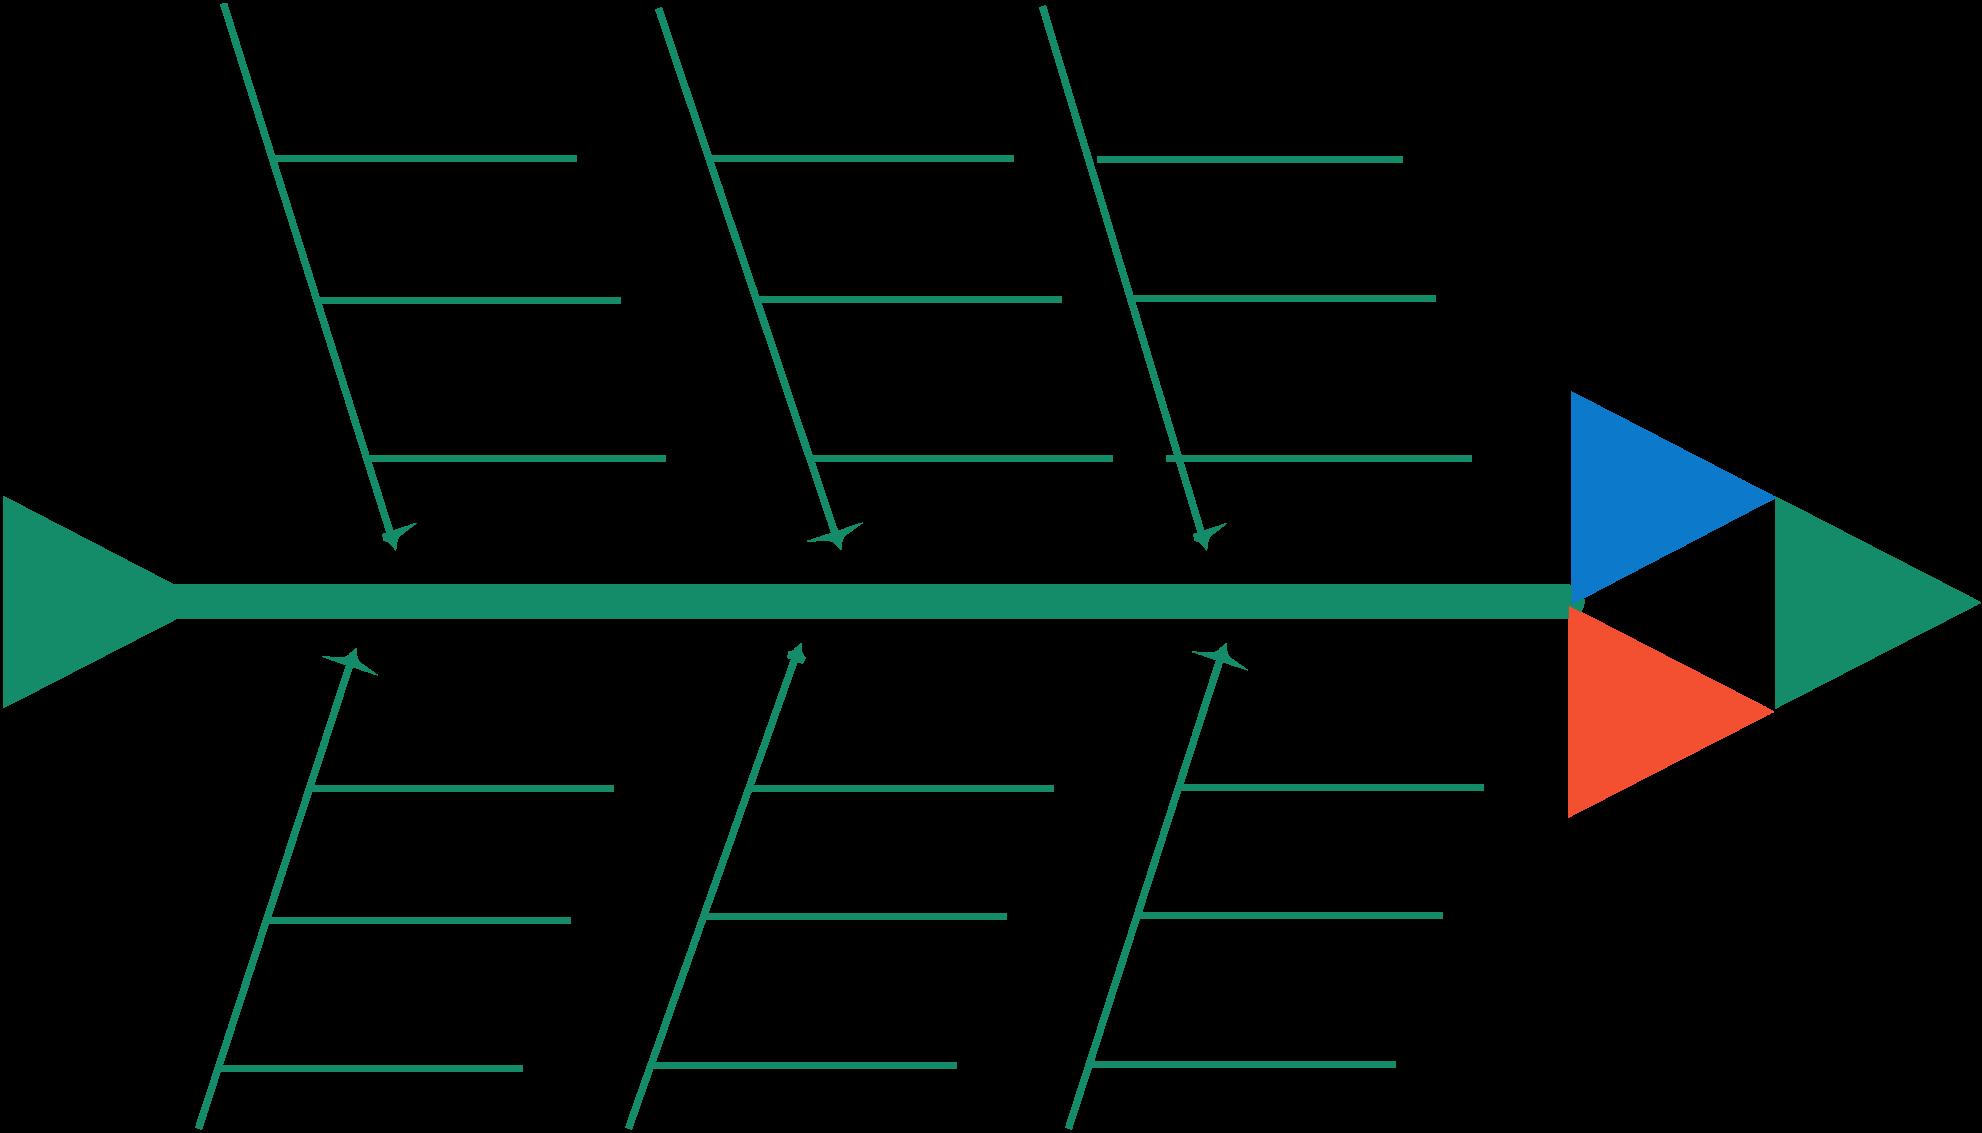 Ishikawa Diagram Template For Creating Your Own Fishbone